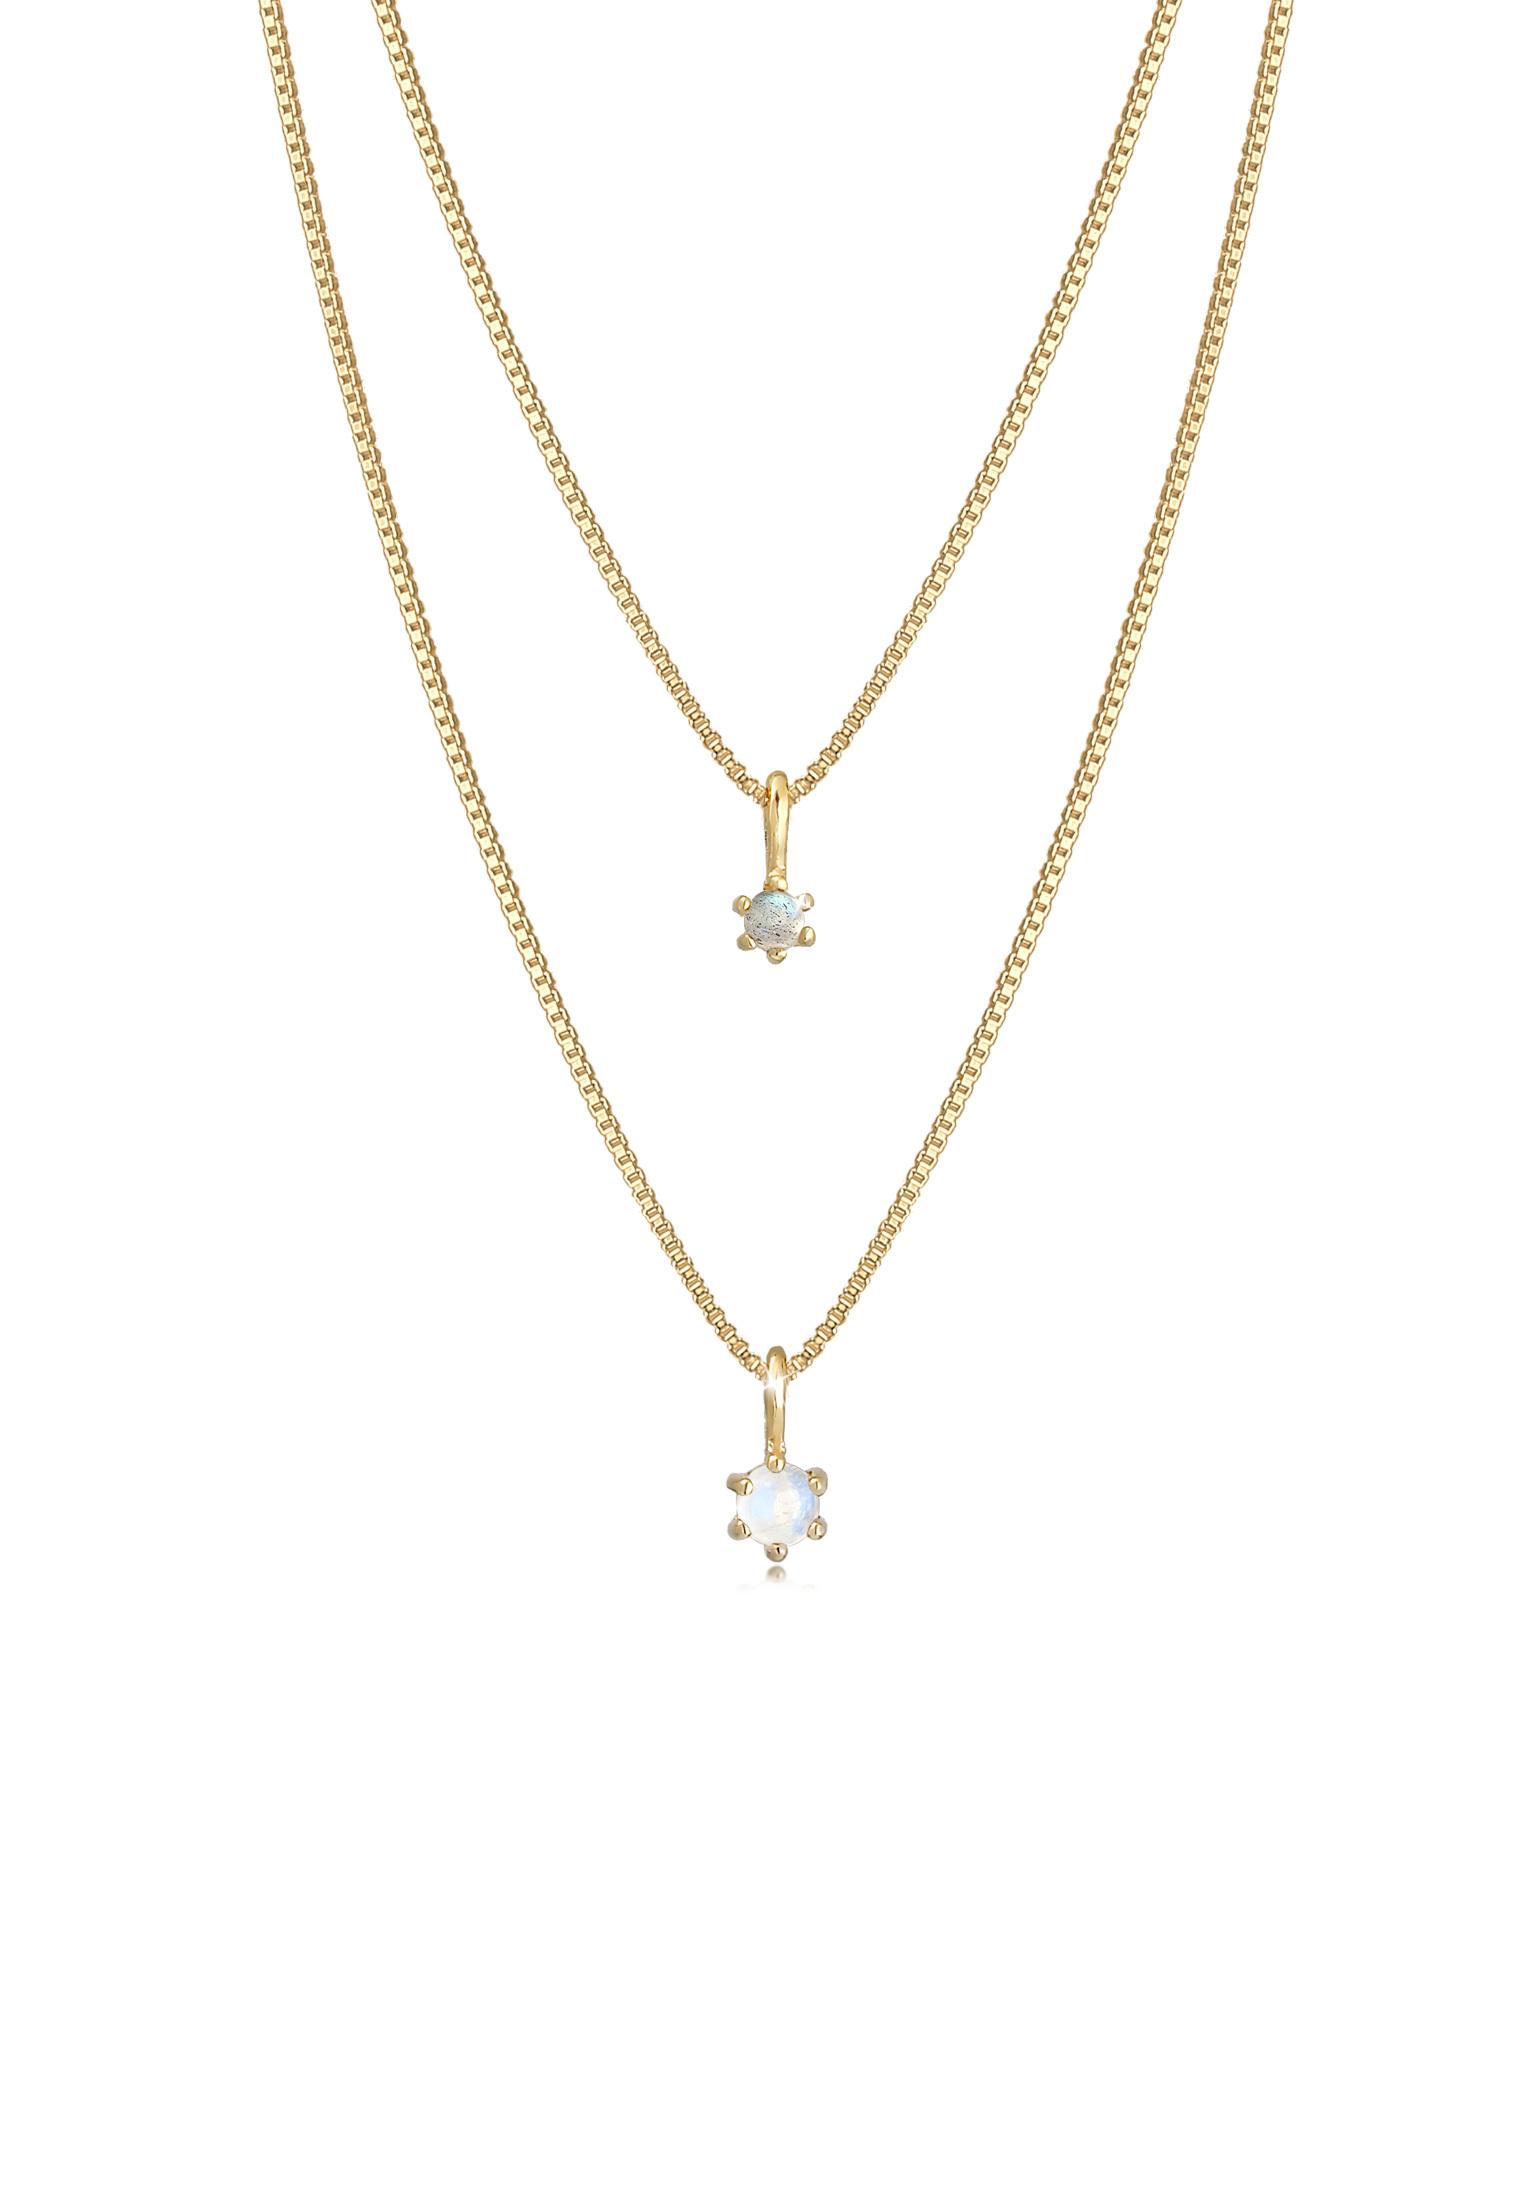 Venezianer-Layer-Halskette | Labradorit ( Grau ) | 925 Sterling Silber vergoldet